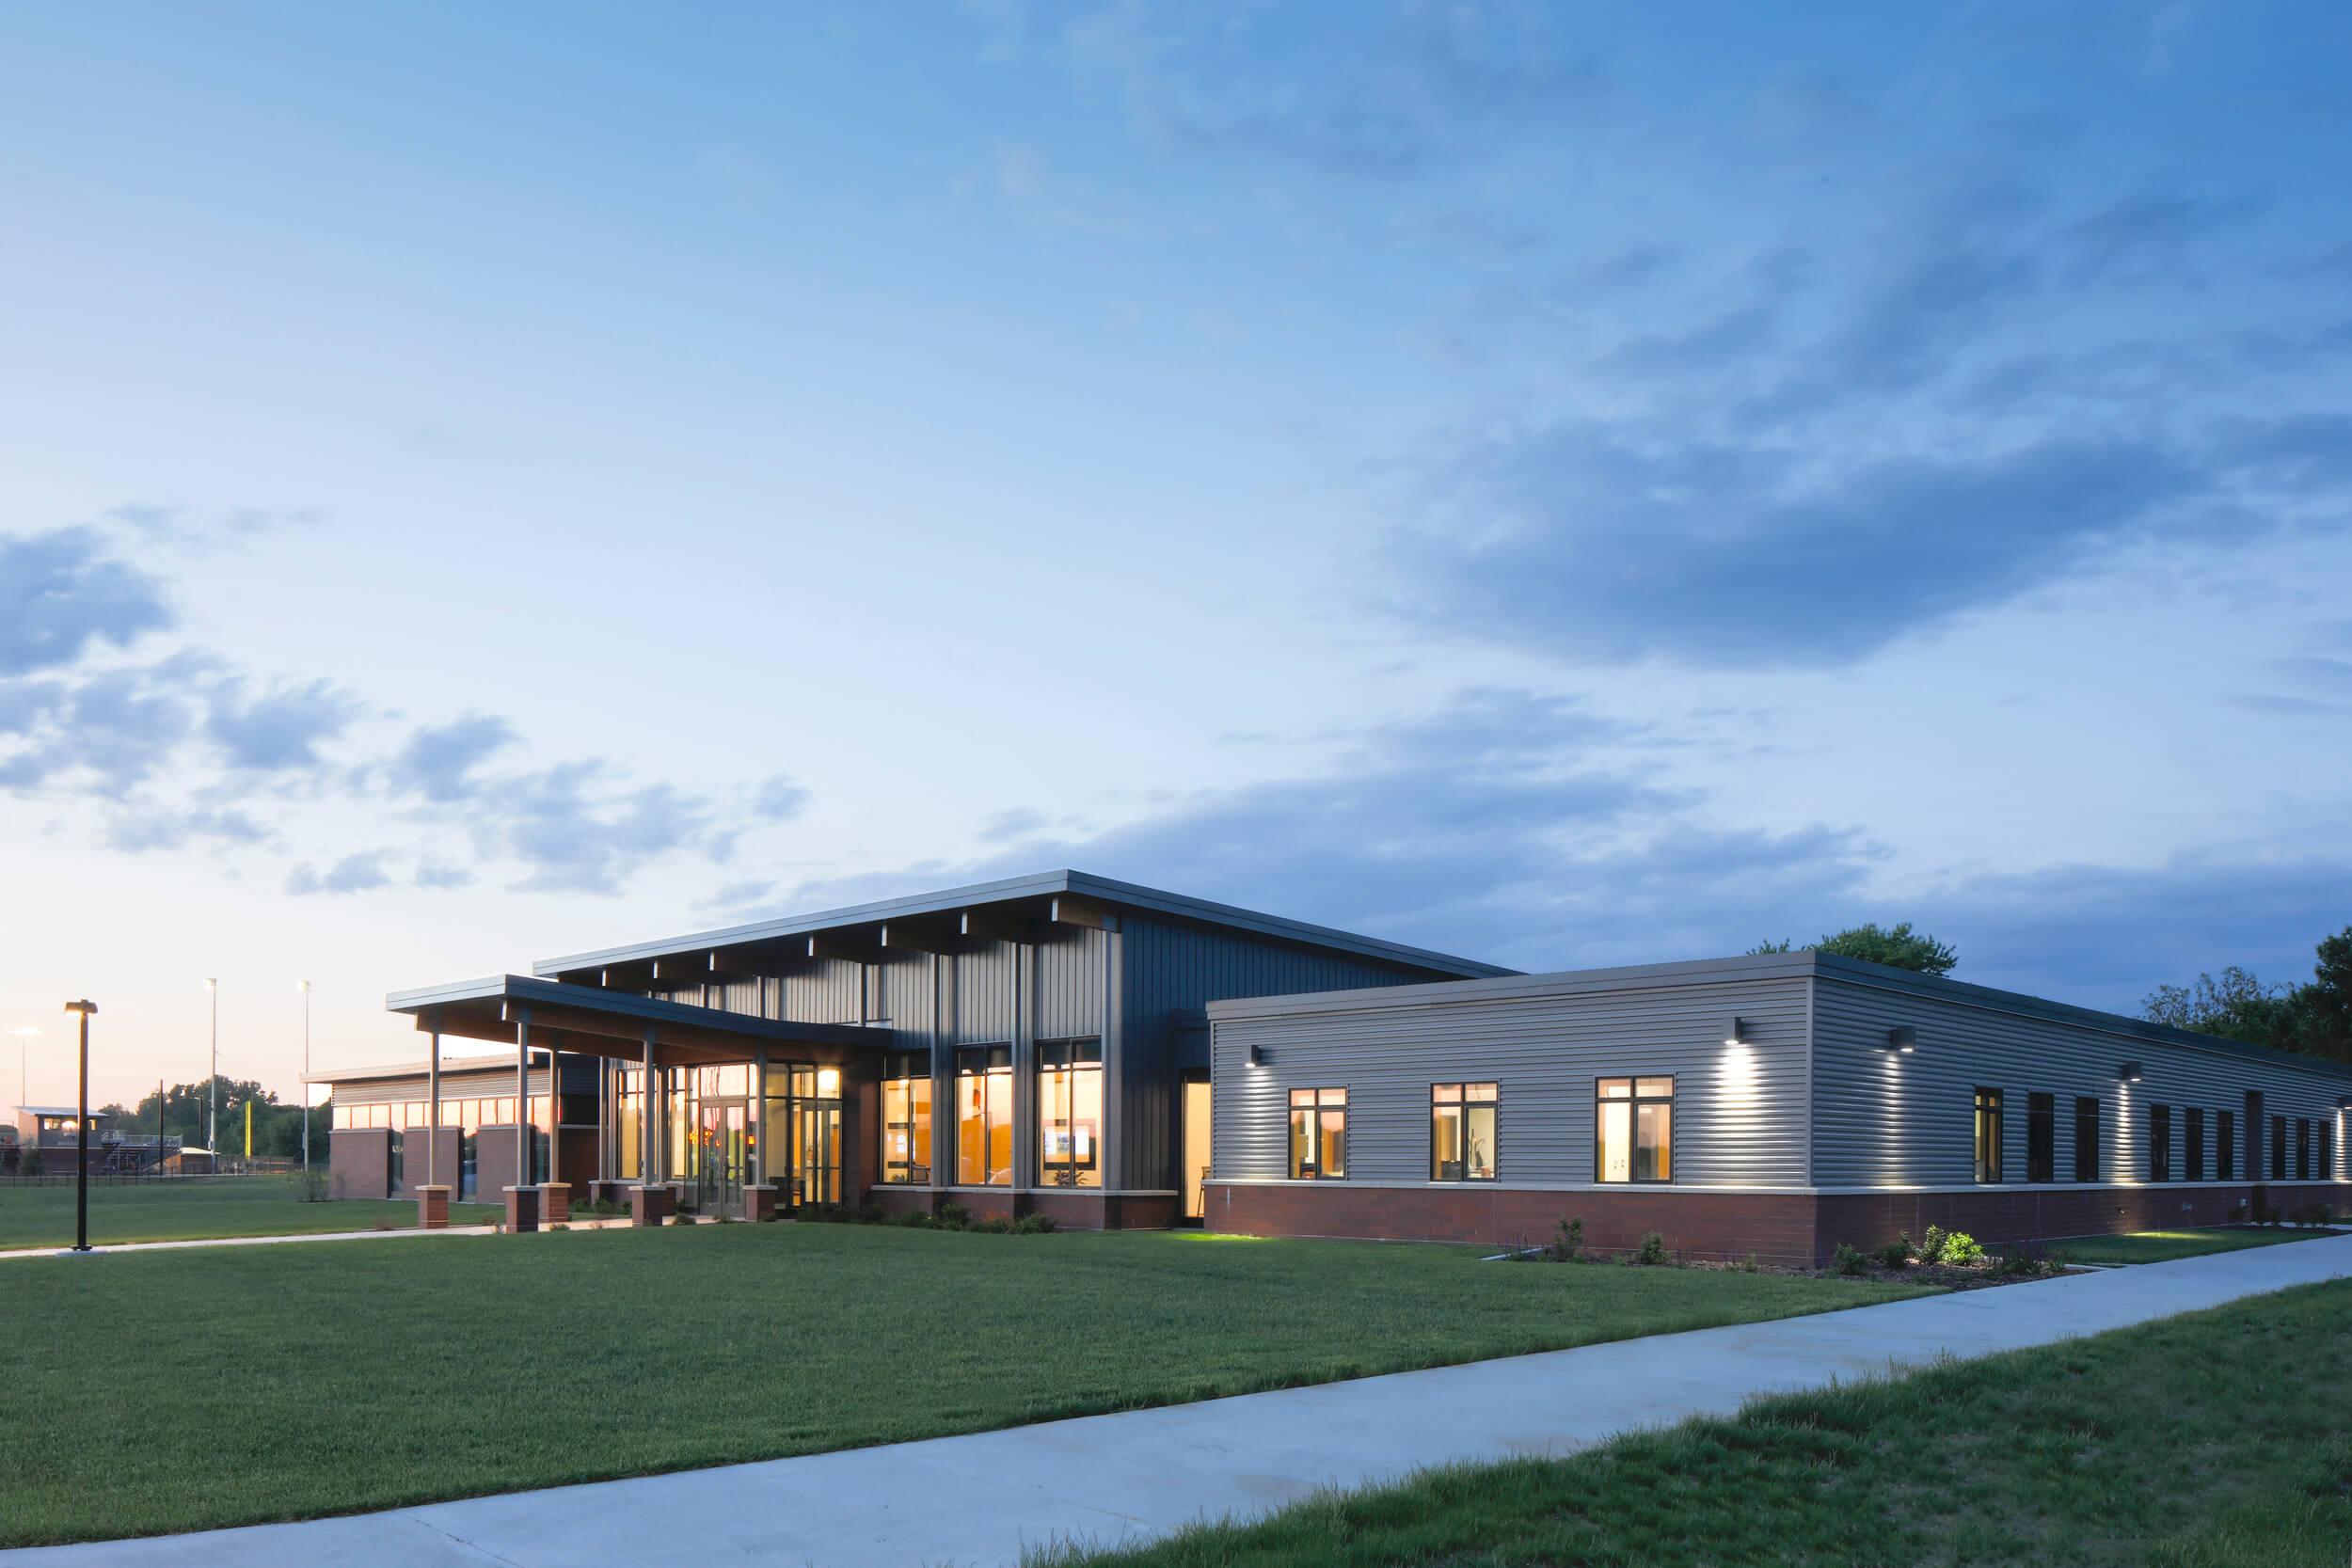 81_Ames Community School District Administration Building